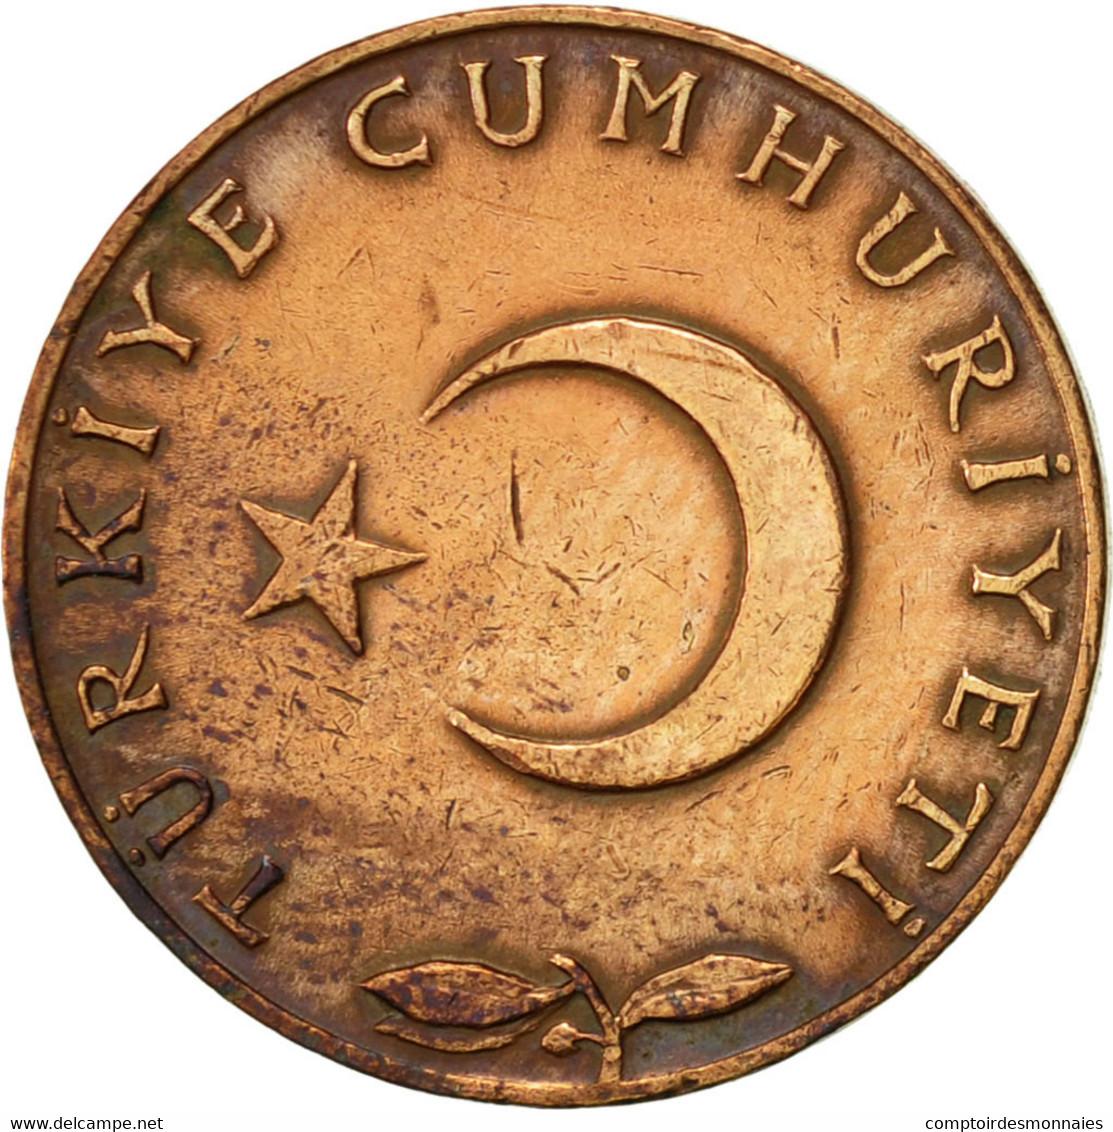 Turquie, 5 Kurus, 1970, TTB, Bronze, KM:890.2 - Turquie